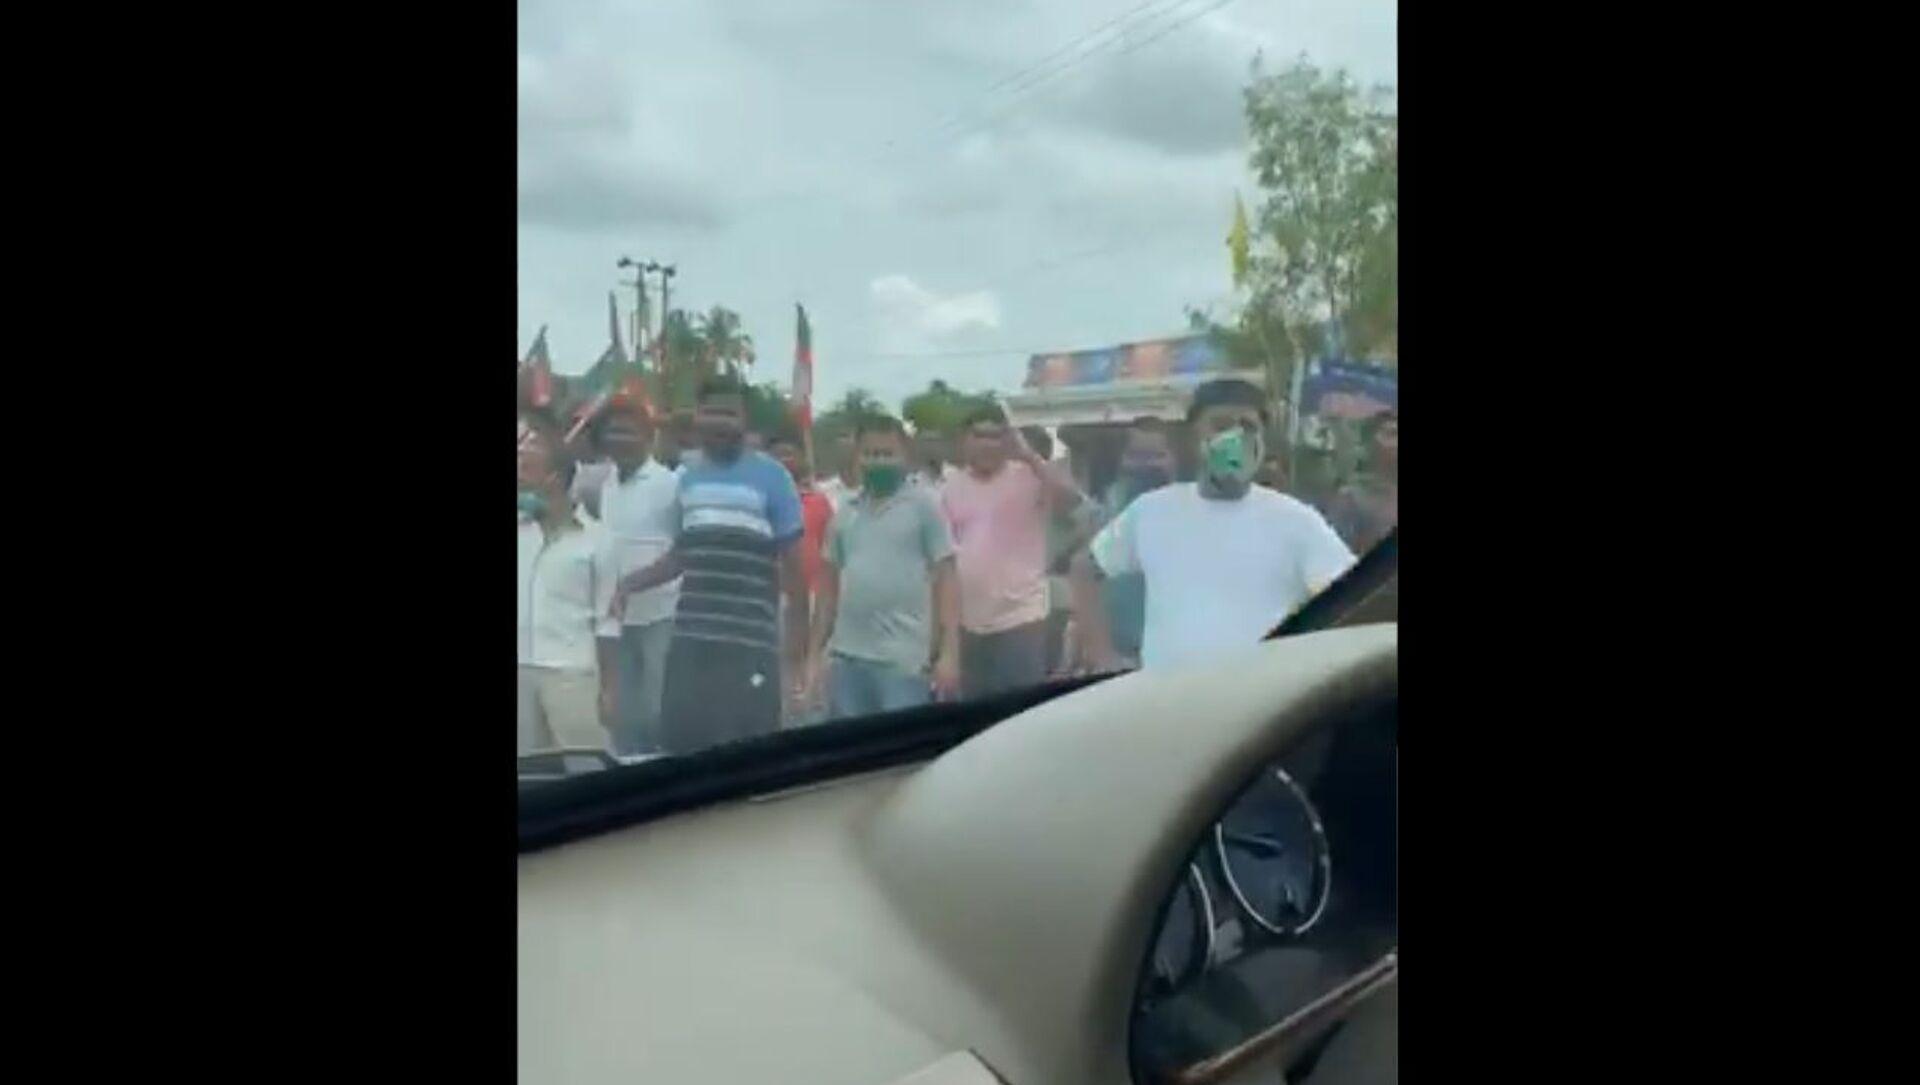 Trinamool Congress (TMC) lawmaker from West Bengal state Abhishek Banerjee was attacked in Tripura state on Monday. - Sputnik International, 1920, 02.08.2021